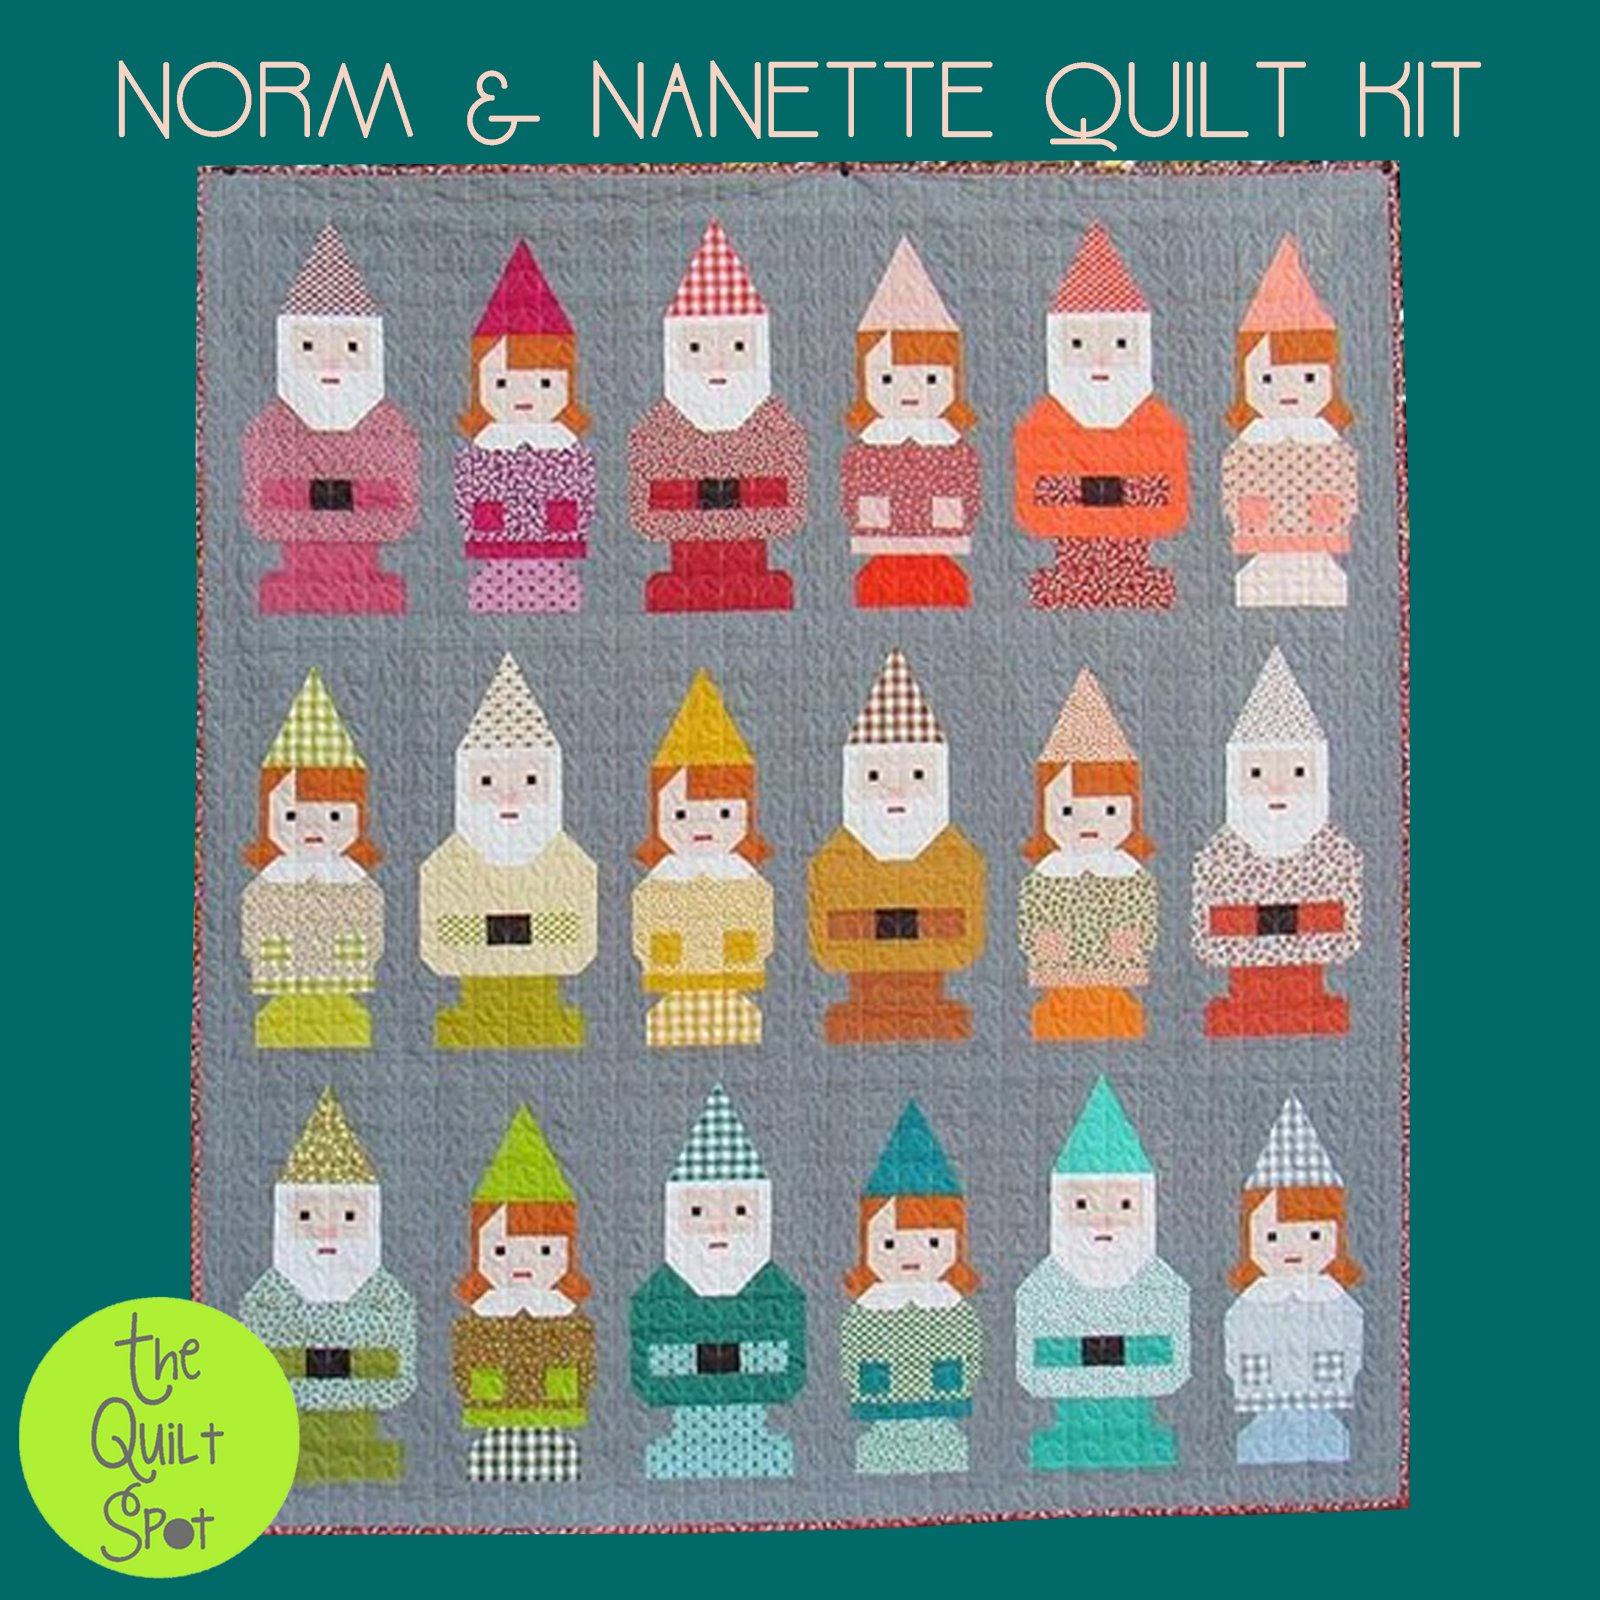 Norm & Nanette Quilt Kit